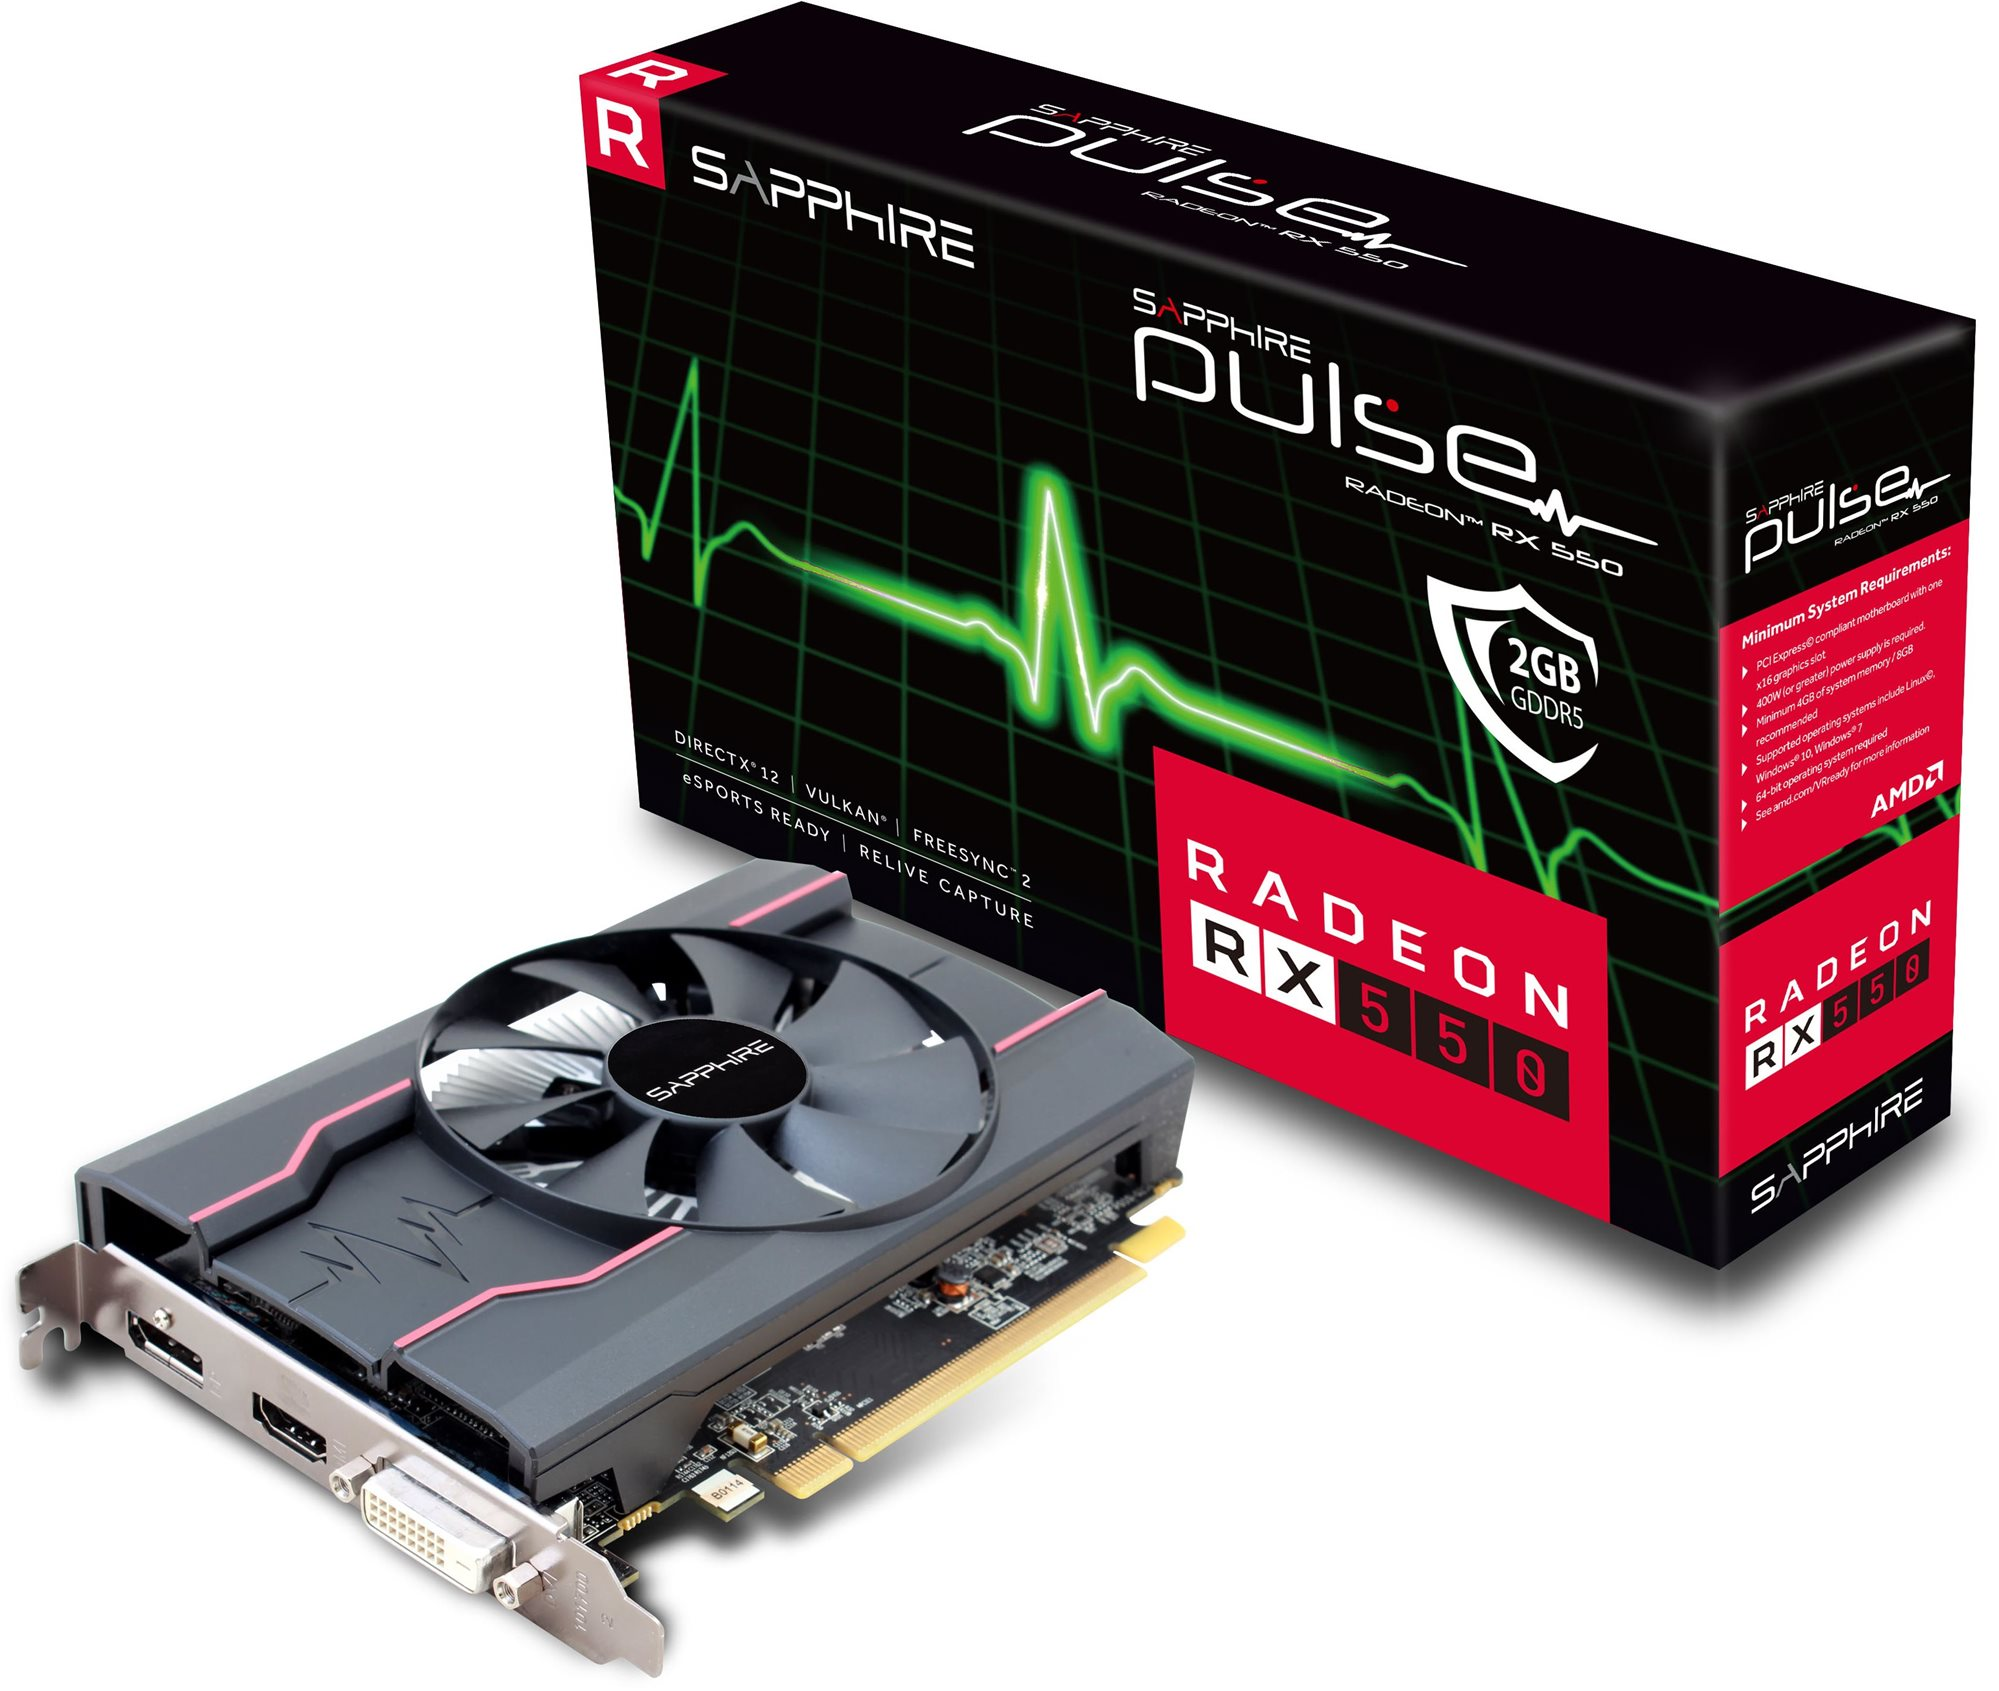 SAPPHIRE PULSE Radeon RX 550 2G